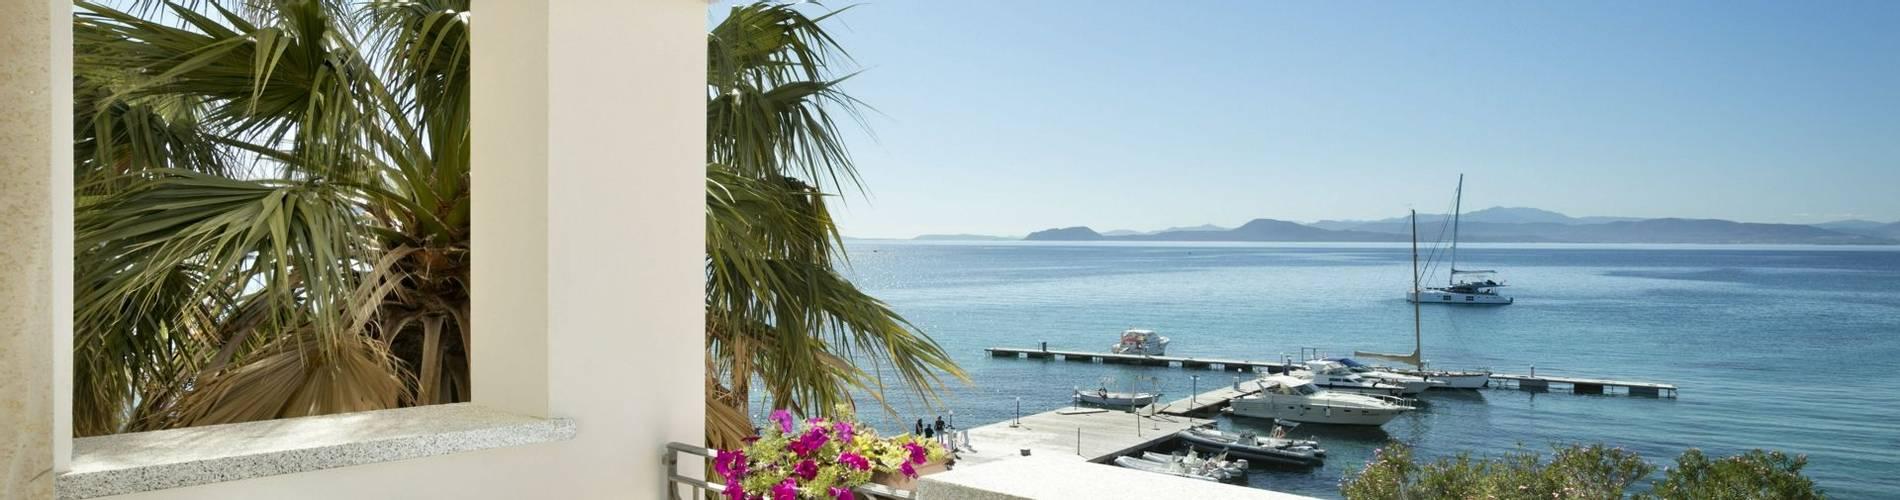 Comfort Sea View -balcony- Gabbiano Azzurro Hotel & Suites Sardegna - stampa1.jpg